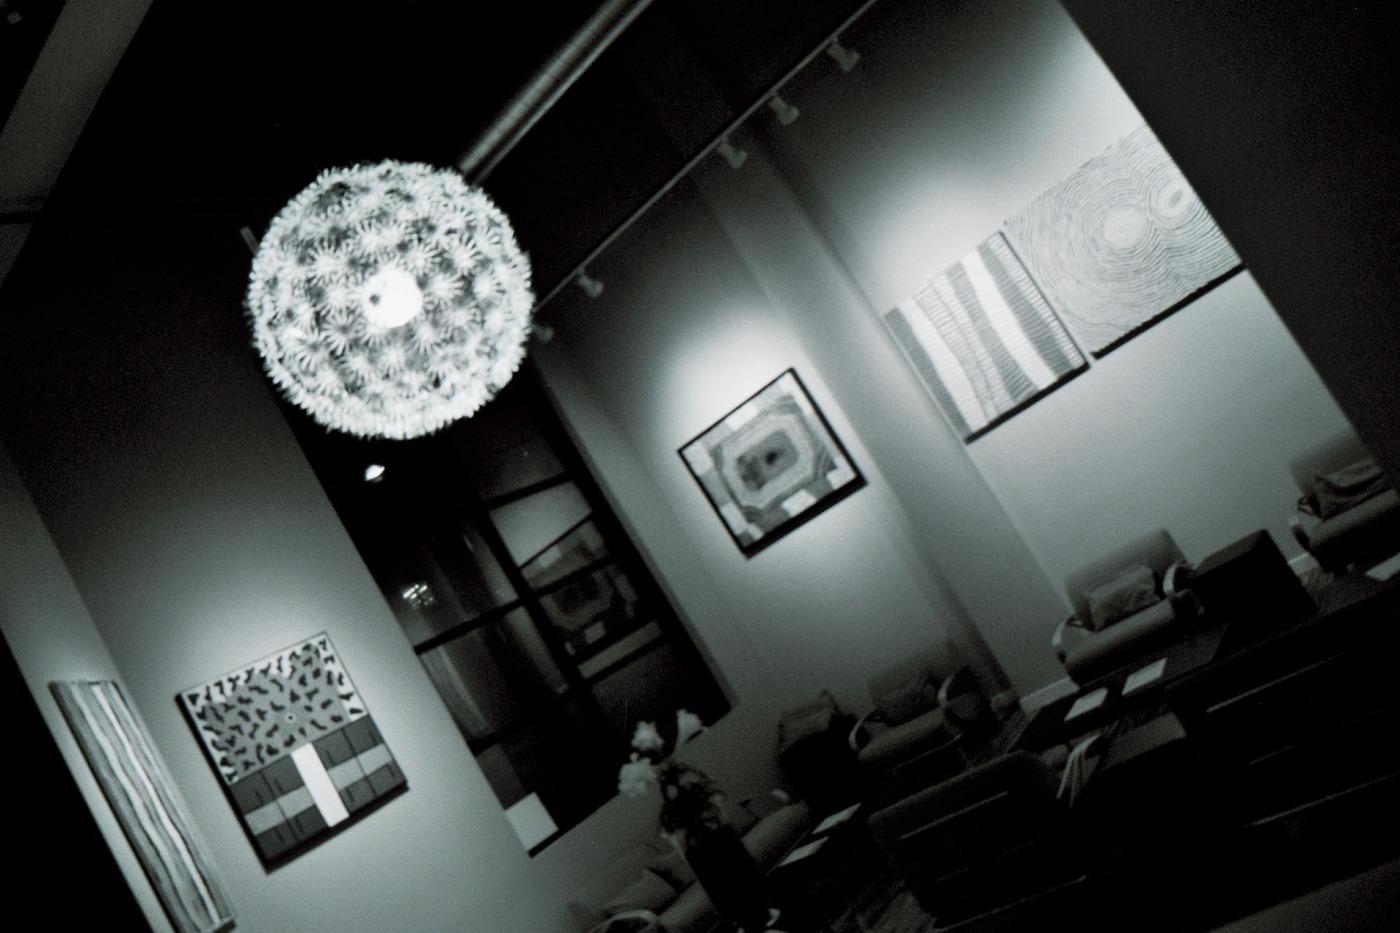 Uptown Upscale Martini Lounge